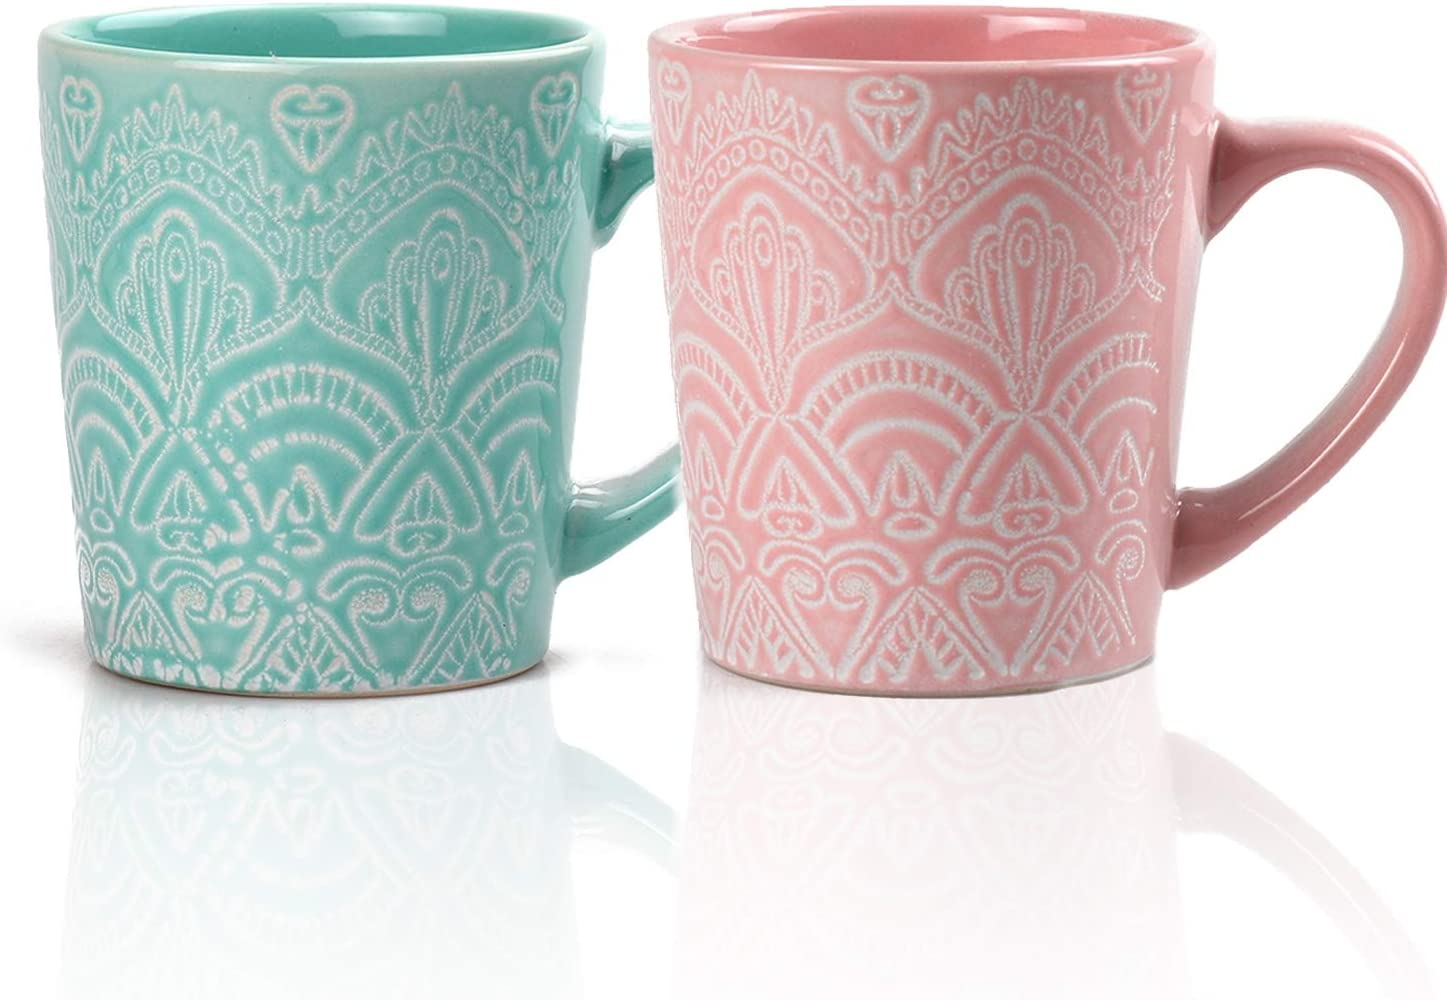 MiliPow Hannah Choice Fine Patterns and Texture Mug - Juego de tazas de café y té (2 unidades, 320 ml), color verde y rosa